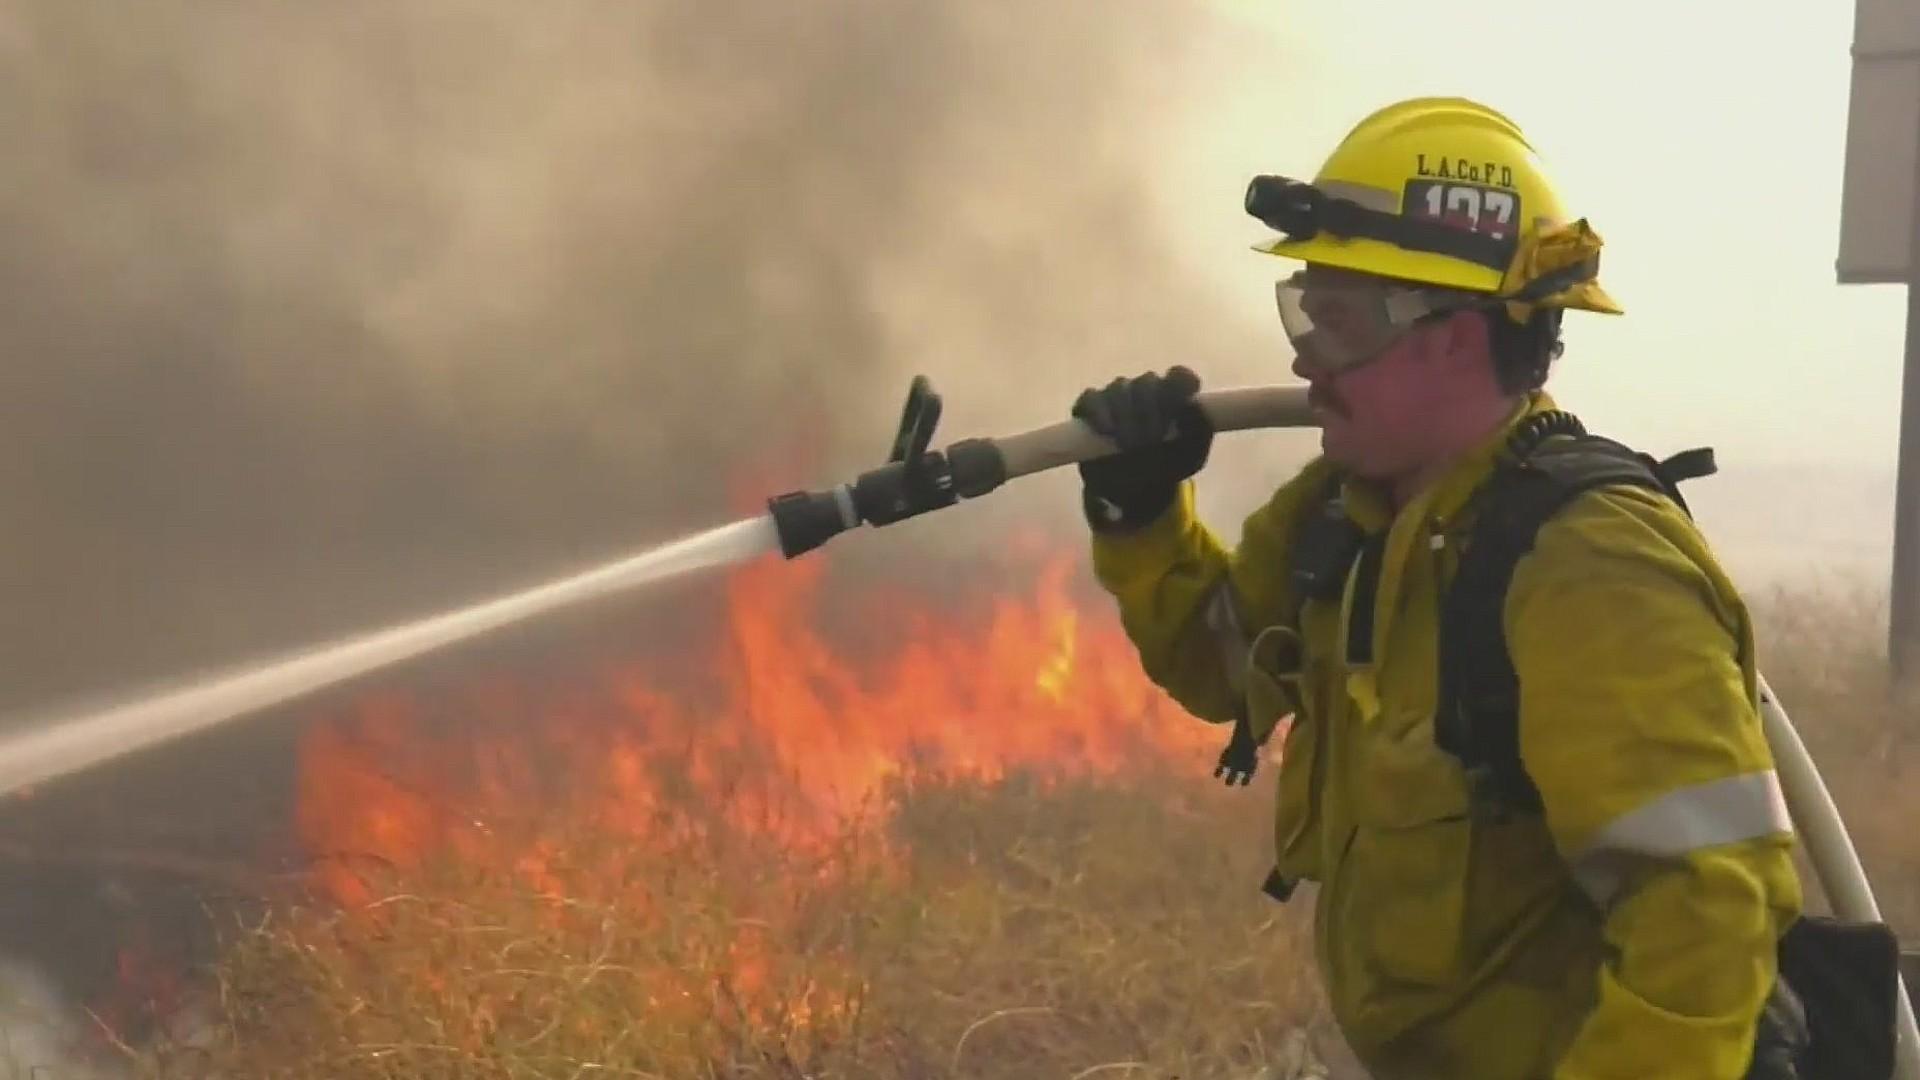 A firefighter battles the Soledad Fire in Santa Clarita on July 5, 2020. (KTLA)